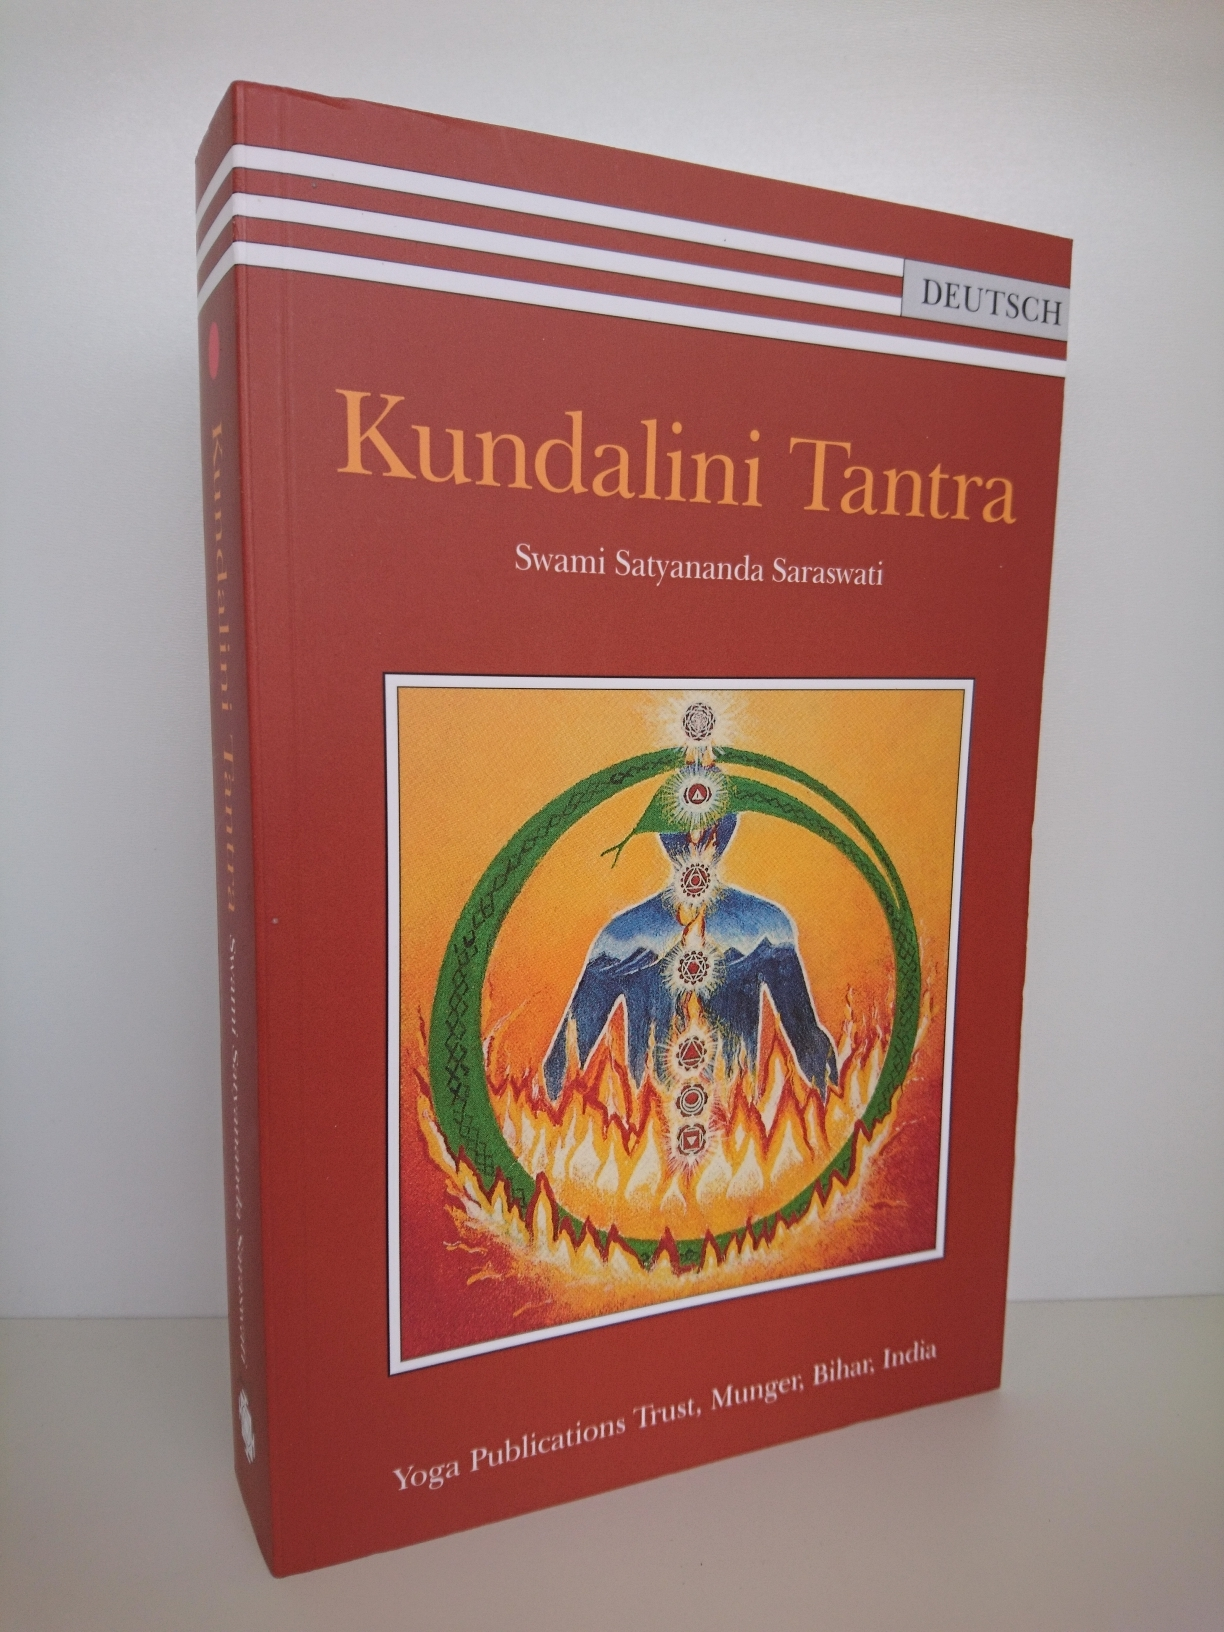 Kundalini Tantra / Swami Satyananda Saraswati. Yoga Publications Trust, Munger, Bihar, India - SatyÄnanda, SvÄmÄ (Verfasser)